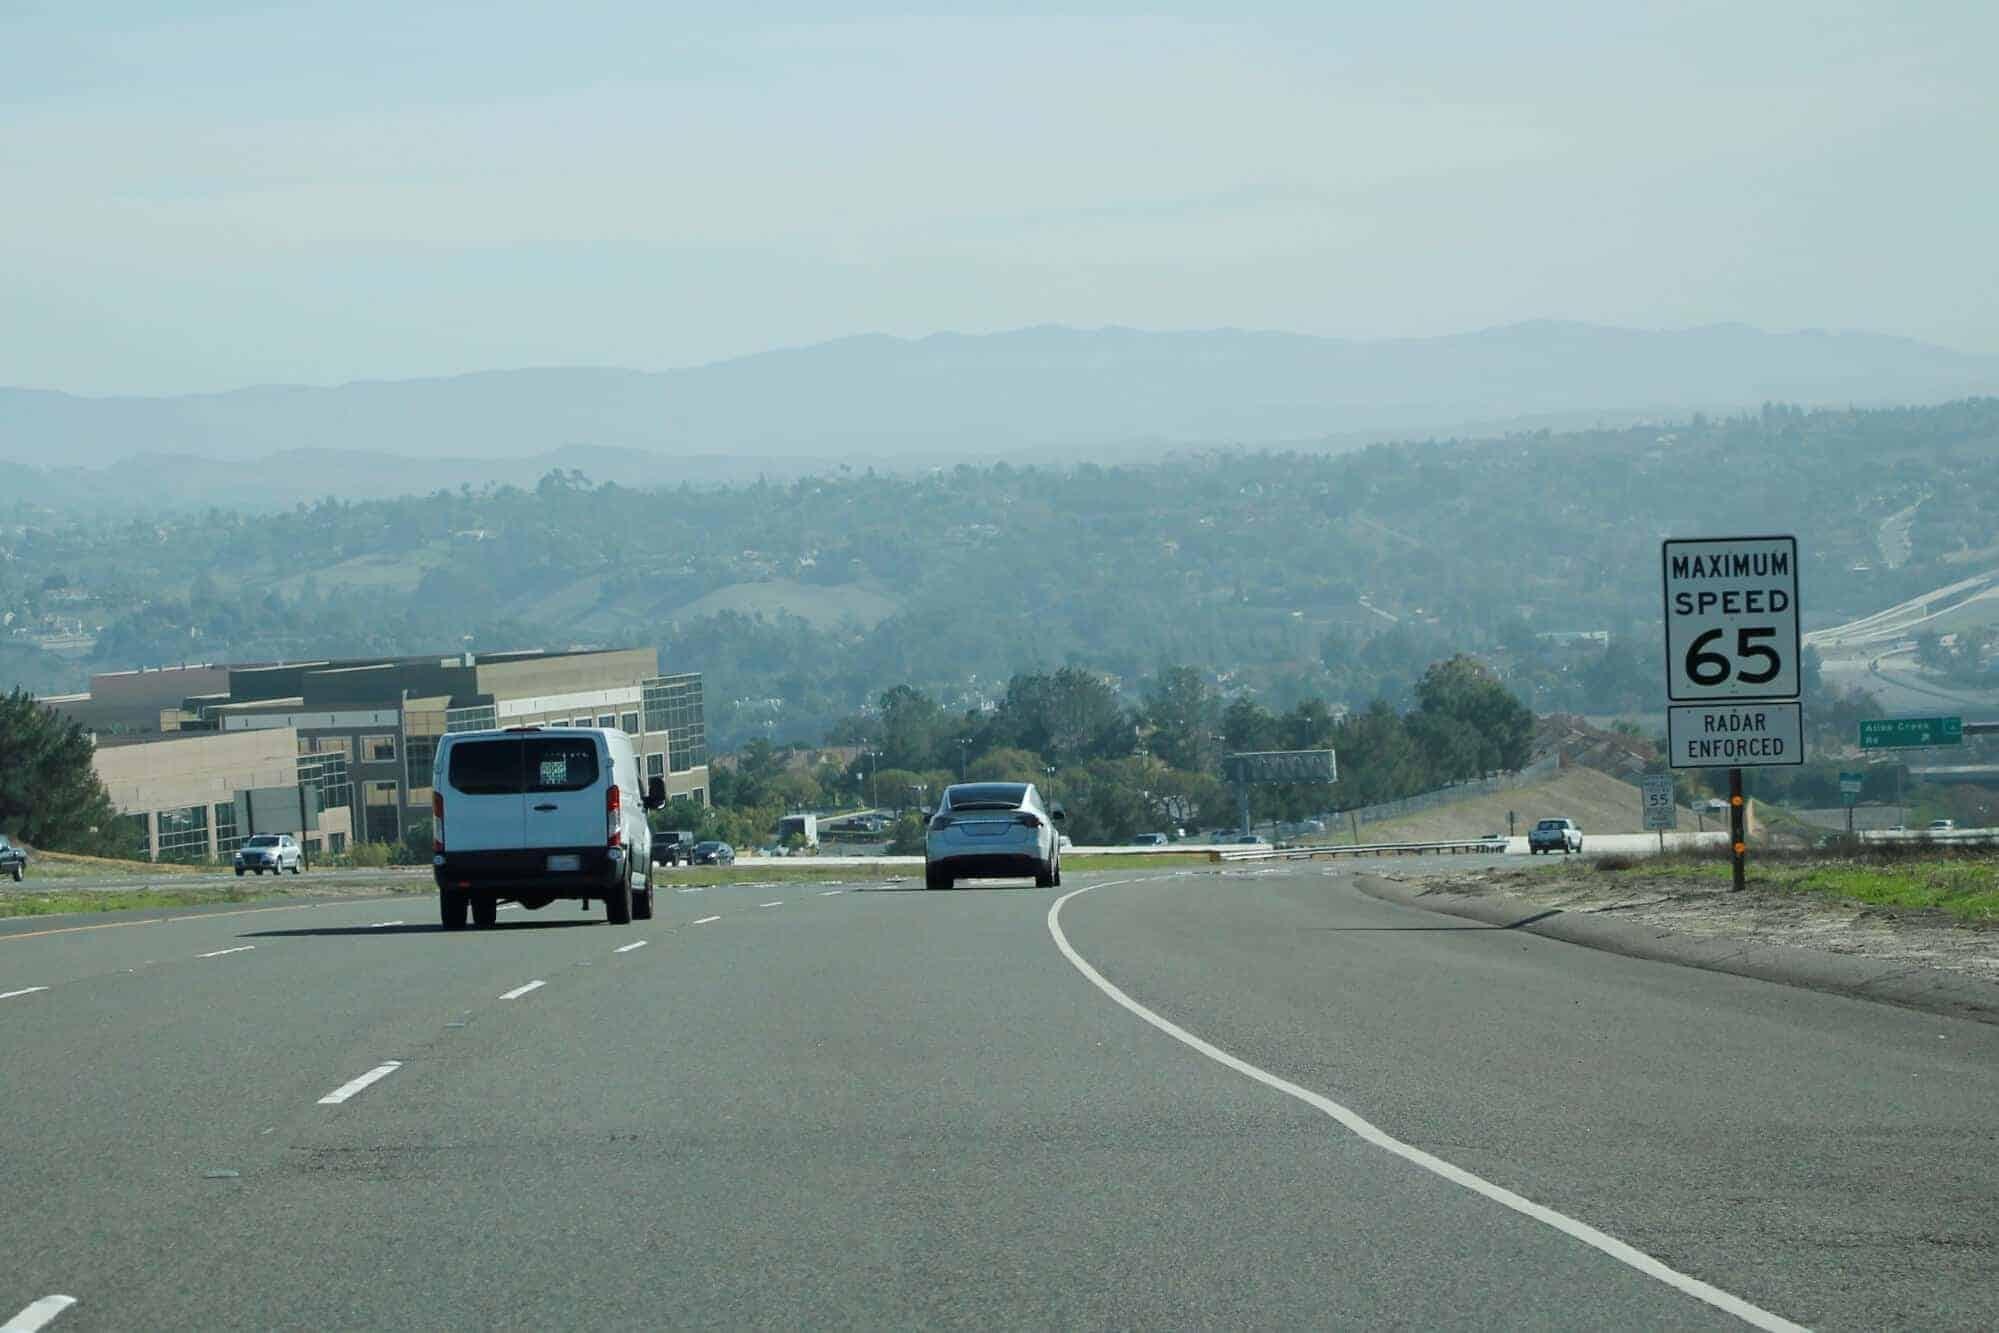 65 mph speed limit sign on freeway